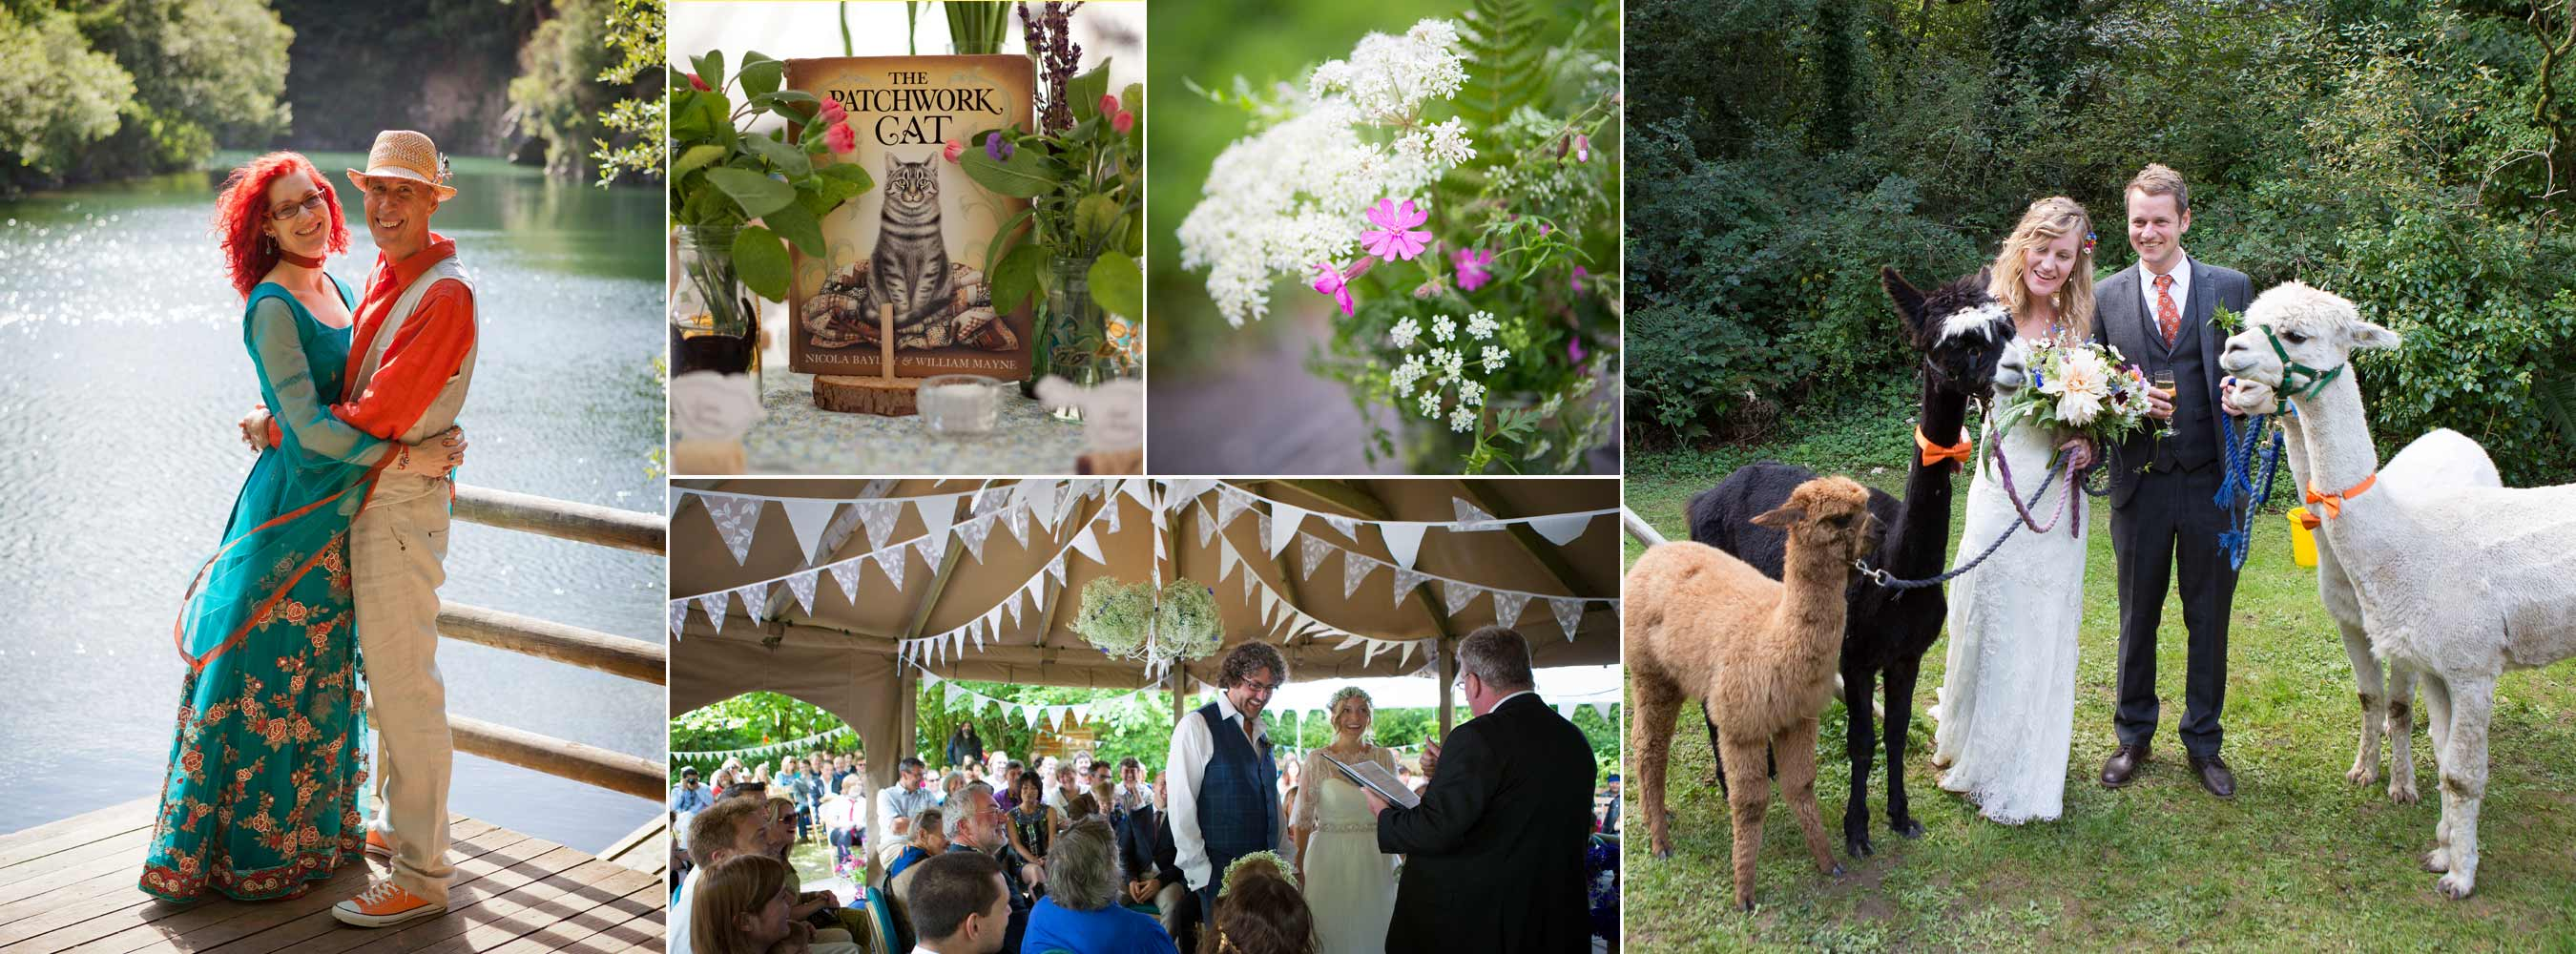 Wedding details alpacas ceremony lake